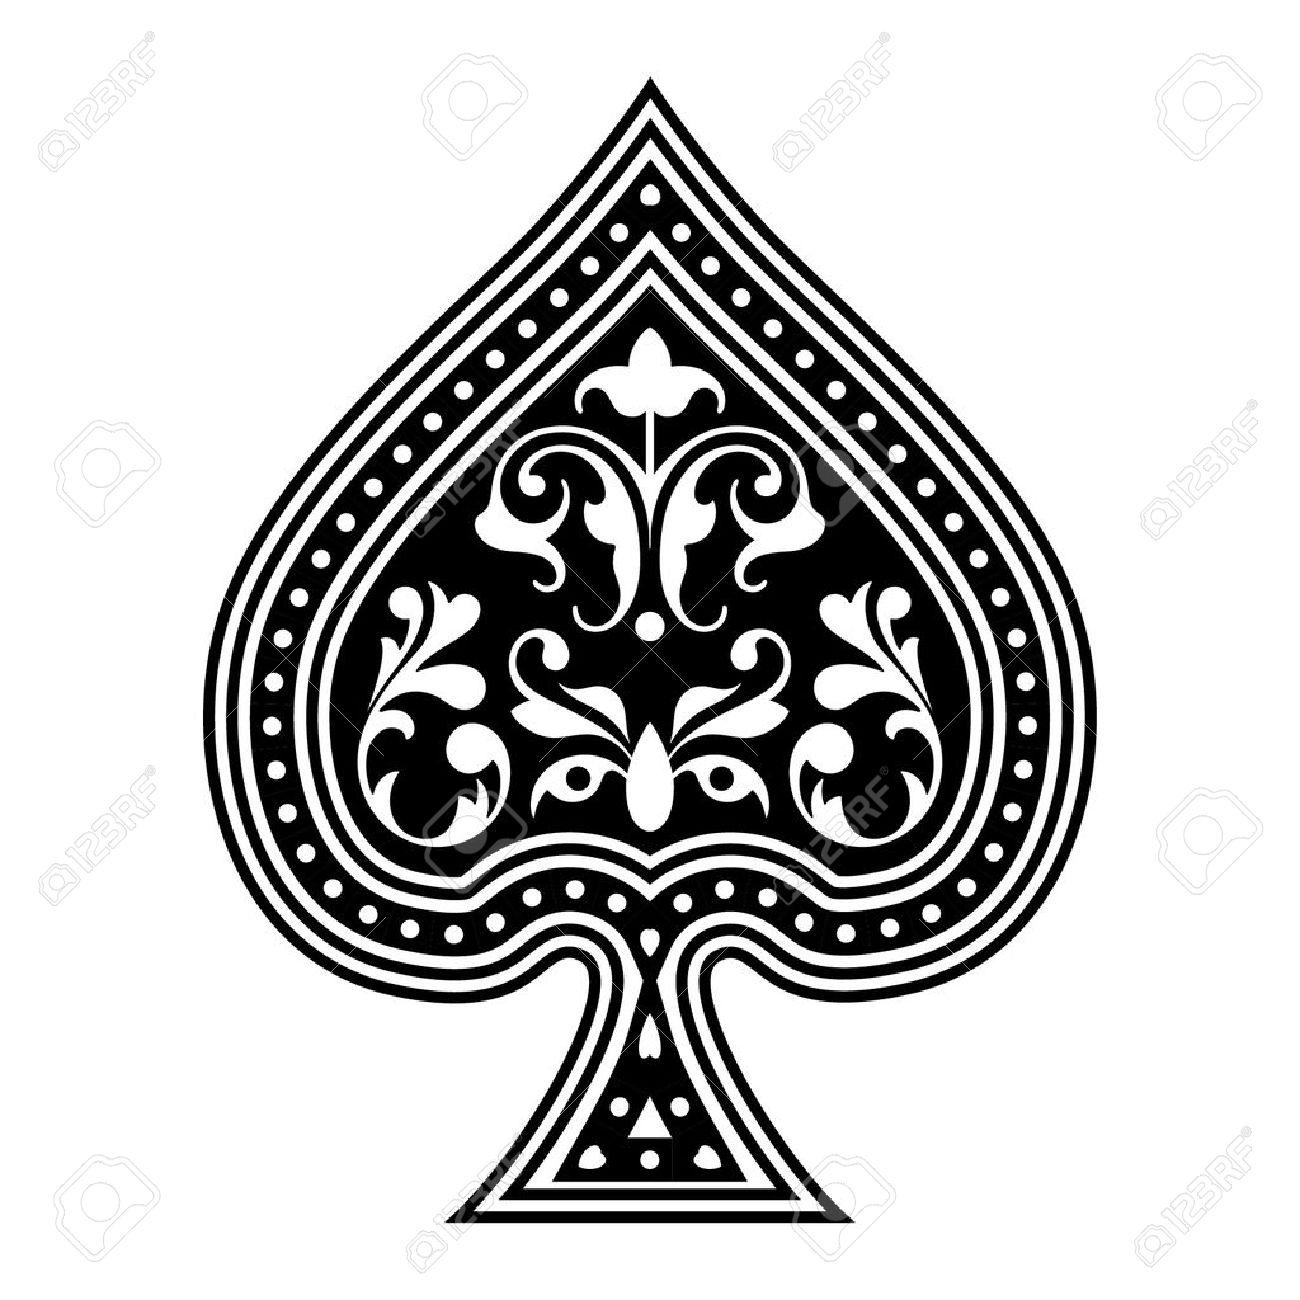 Spade an Ornate Playing Card